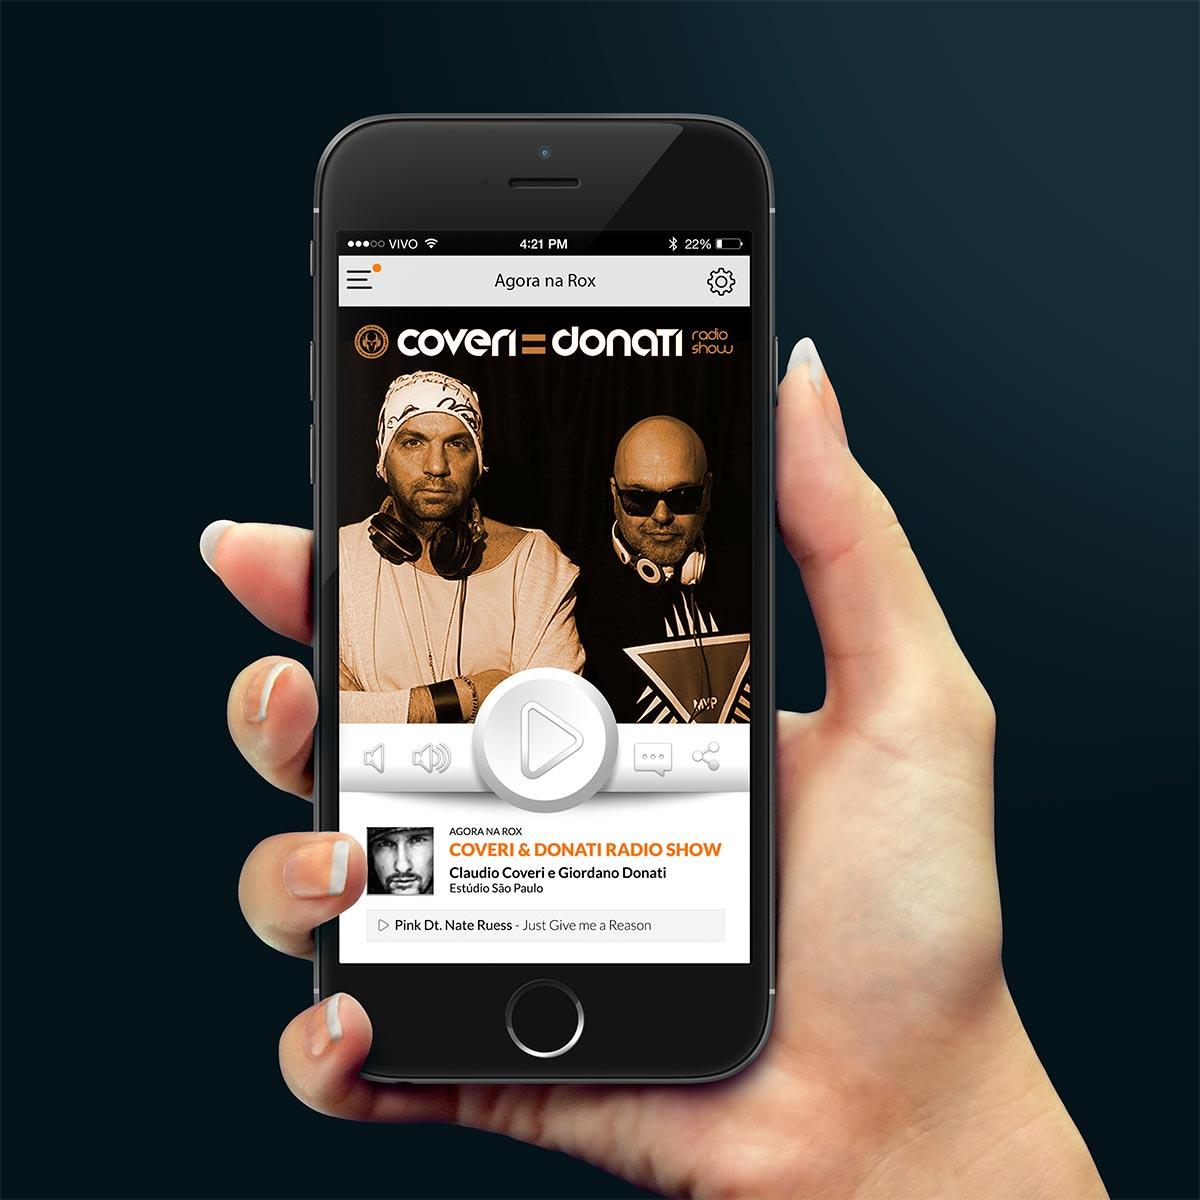 Mobile App Rádio Rox